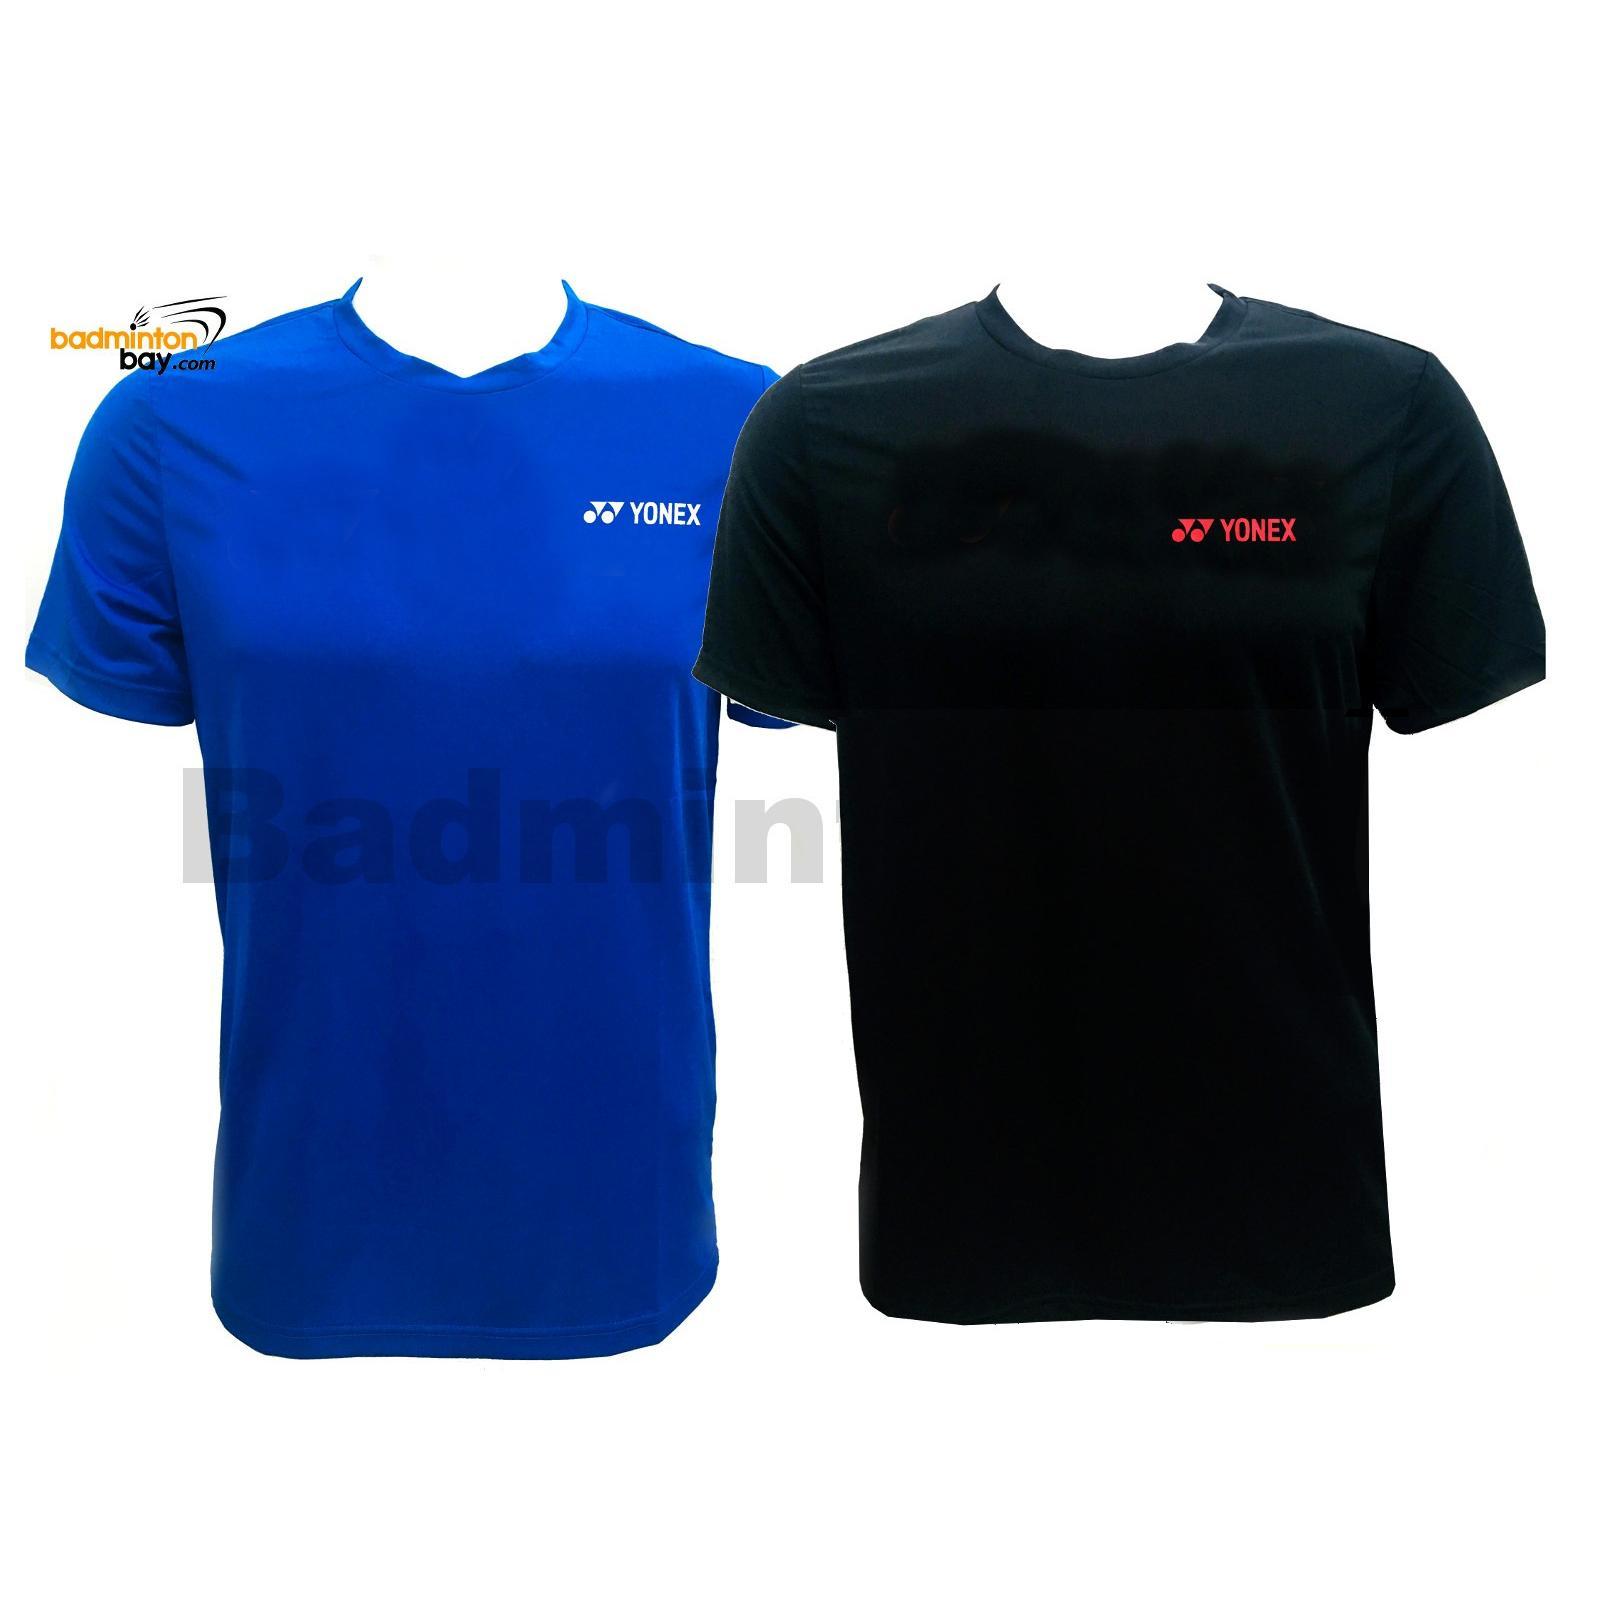 32db2bd81 2 Pieces - Yonex - Round Neck Small Logo T-Shirt Quick Dry Sports ...